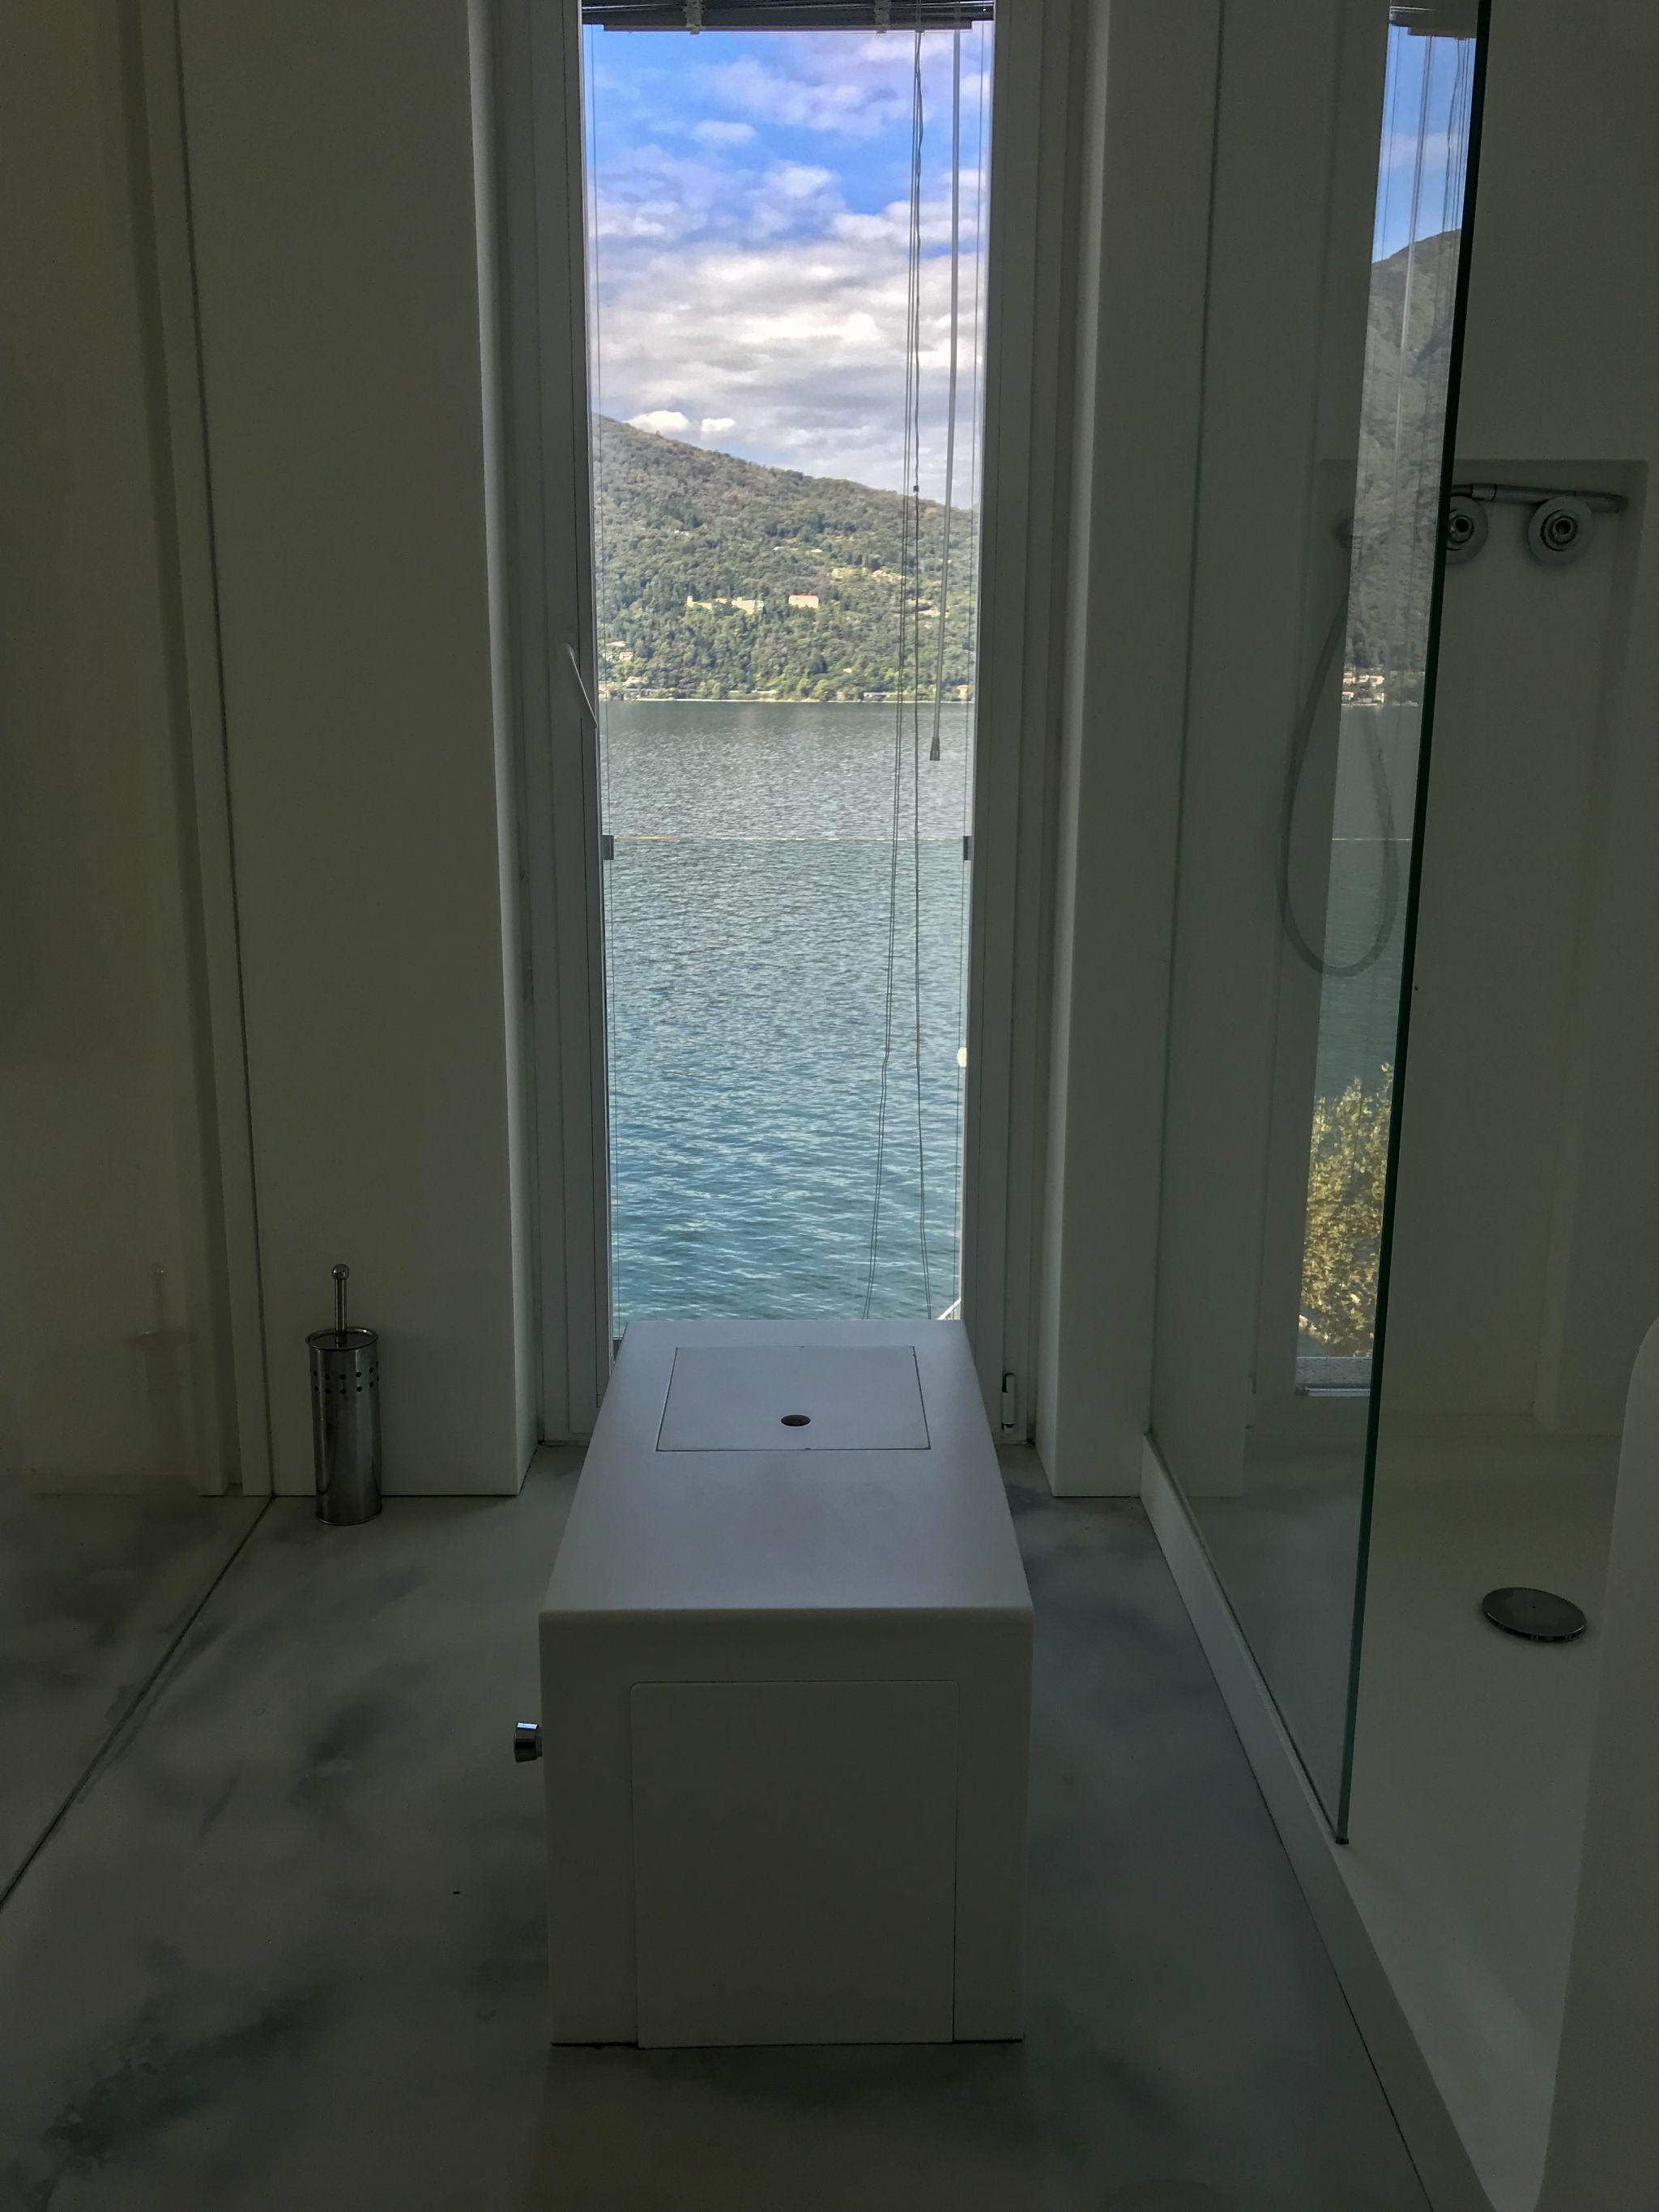 Loo Lakeside views in Lake Maggiore